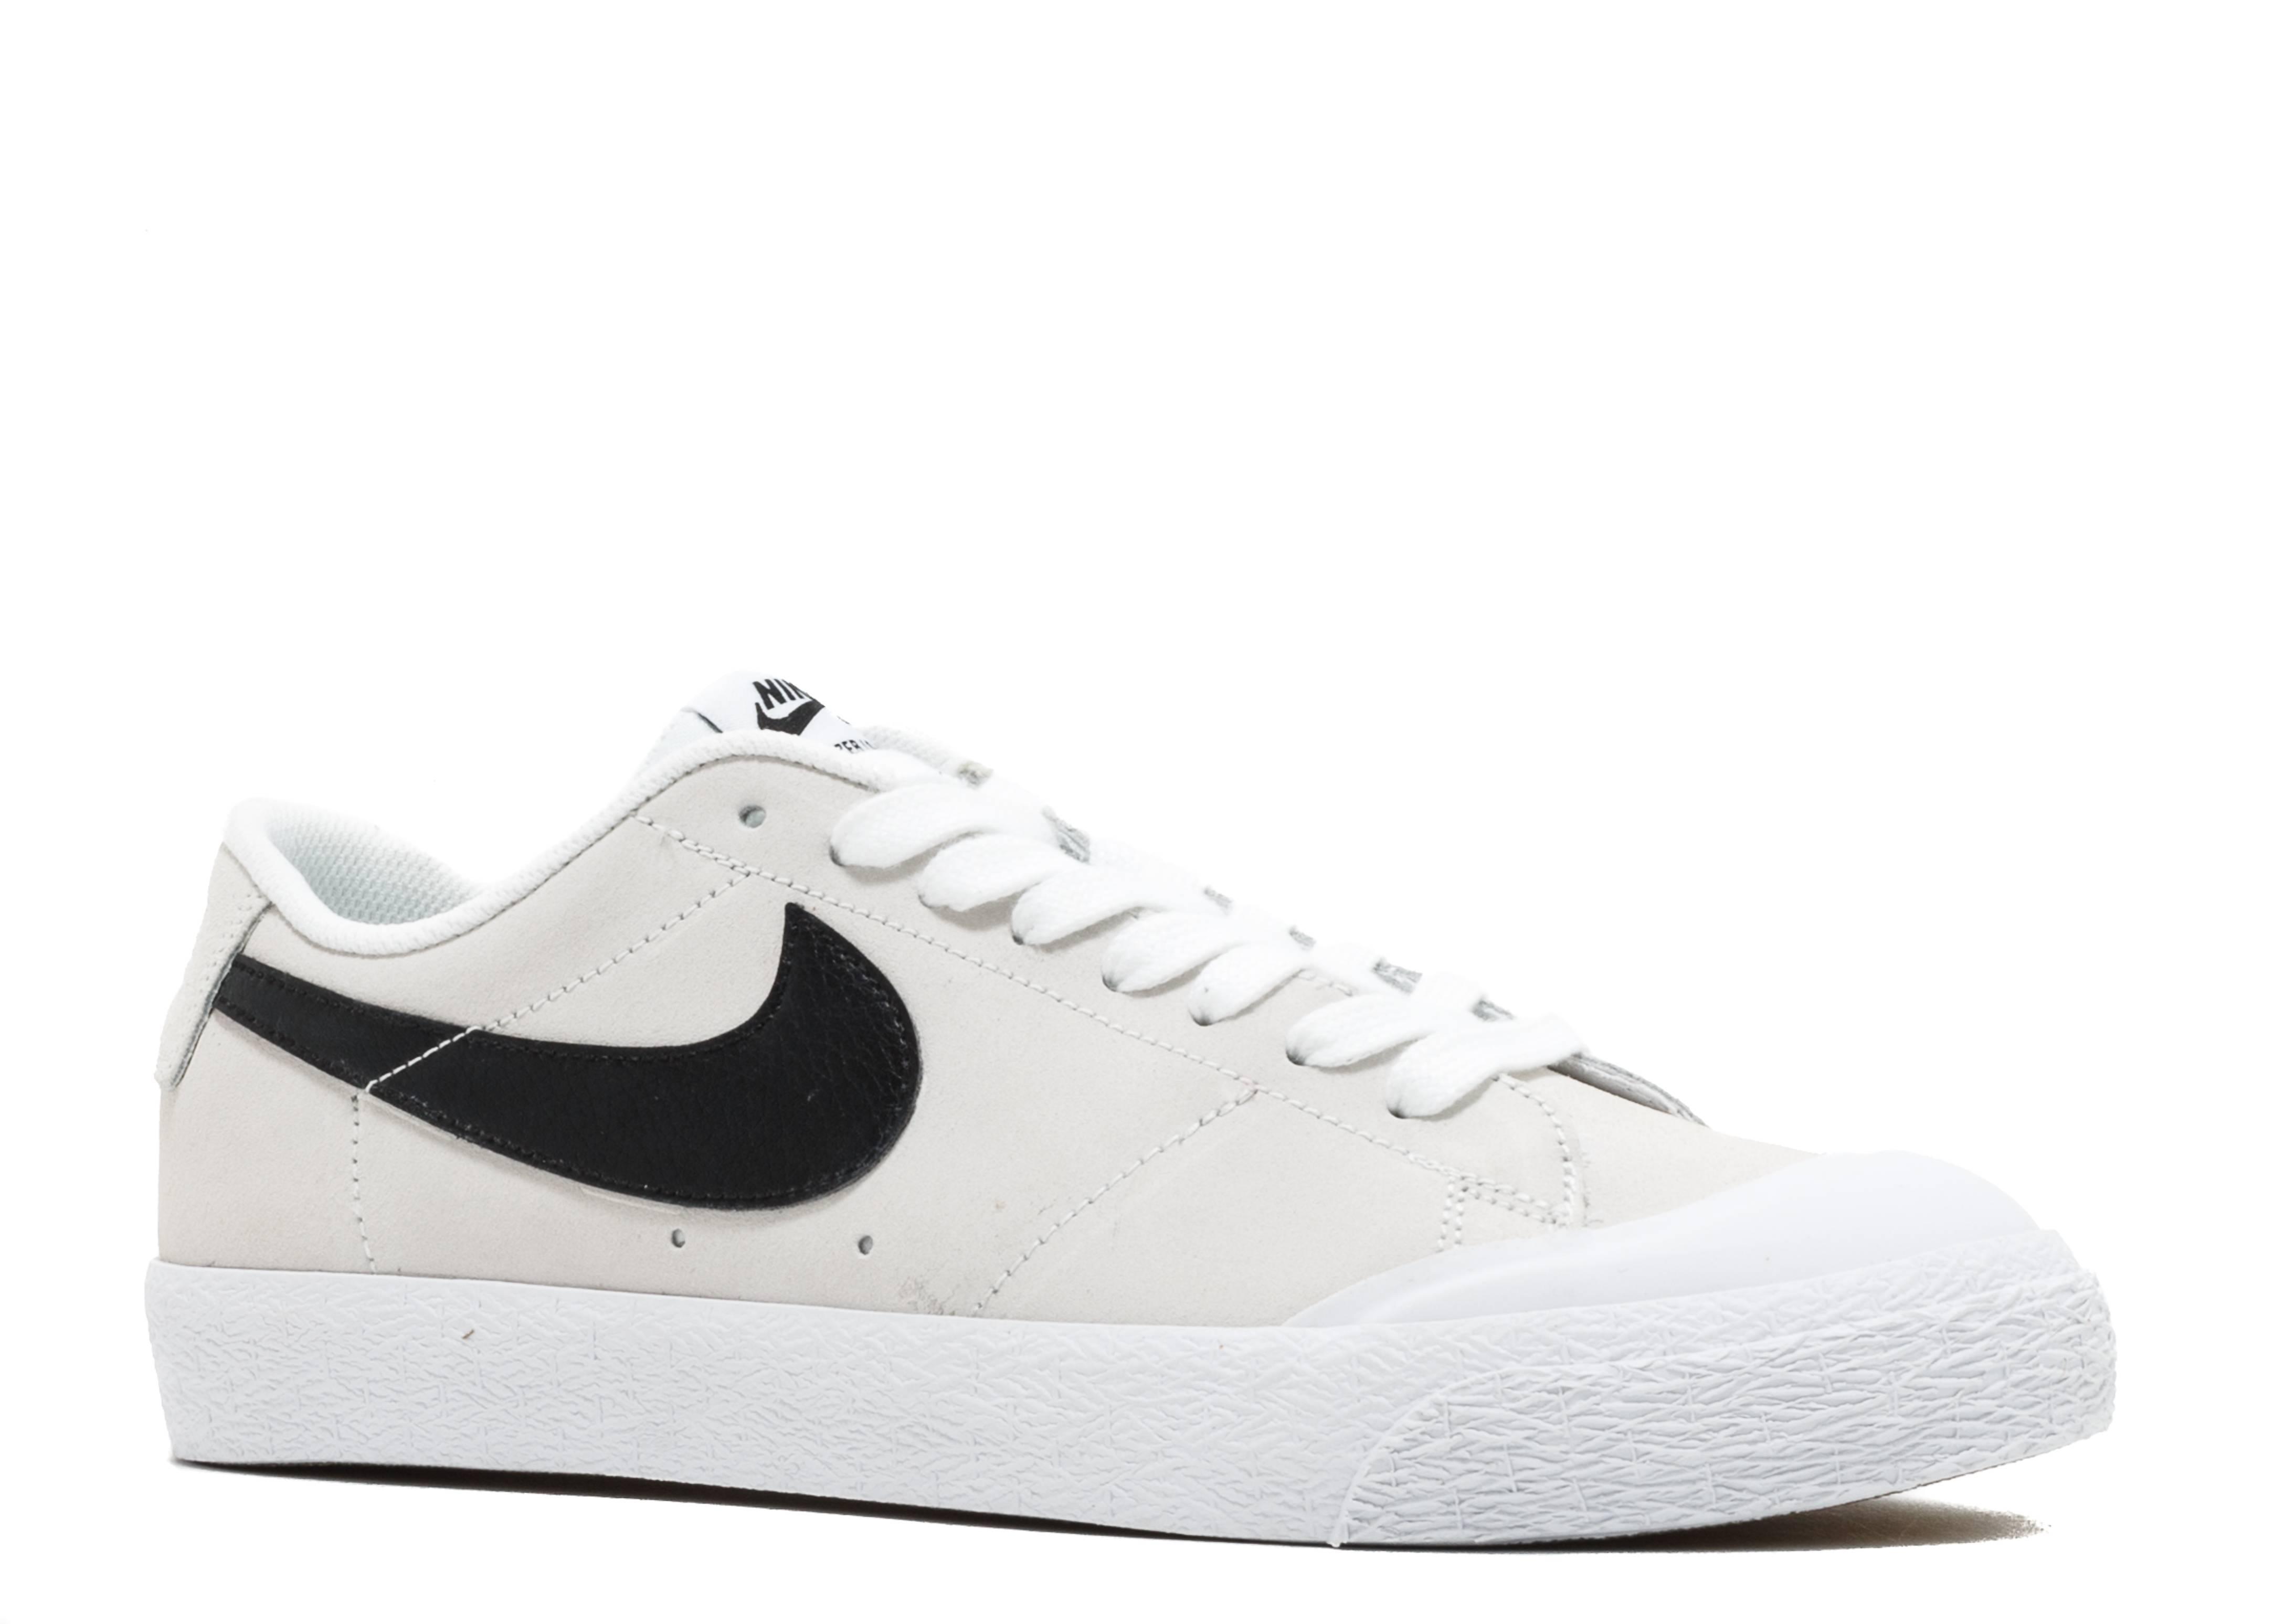 SB Blazer Zoom Low XT 'White Black' - Nike - 864348 101 - white ...